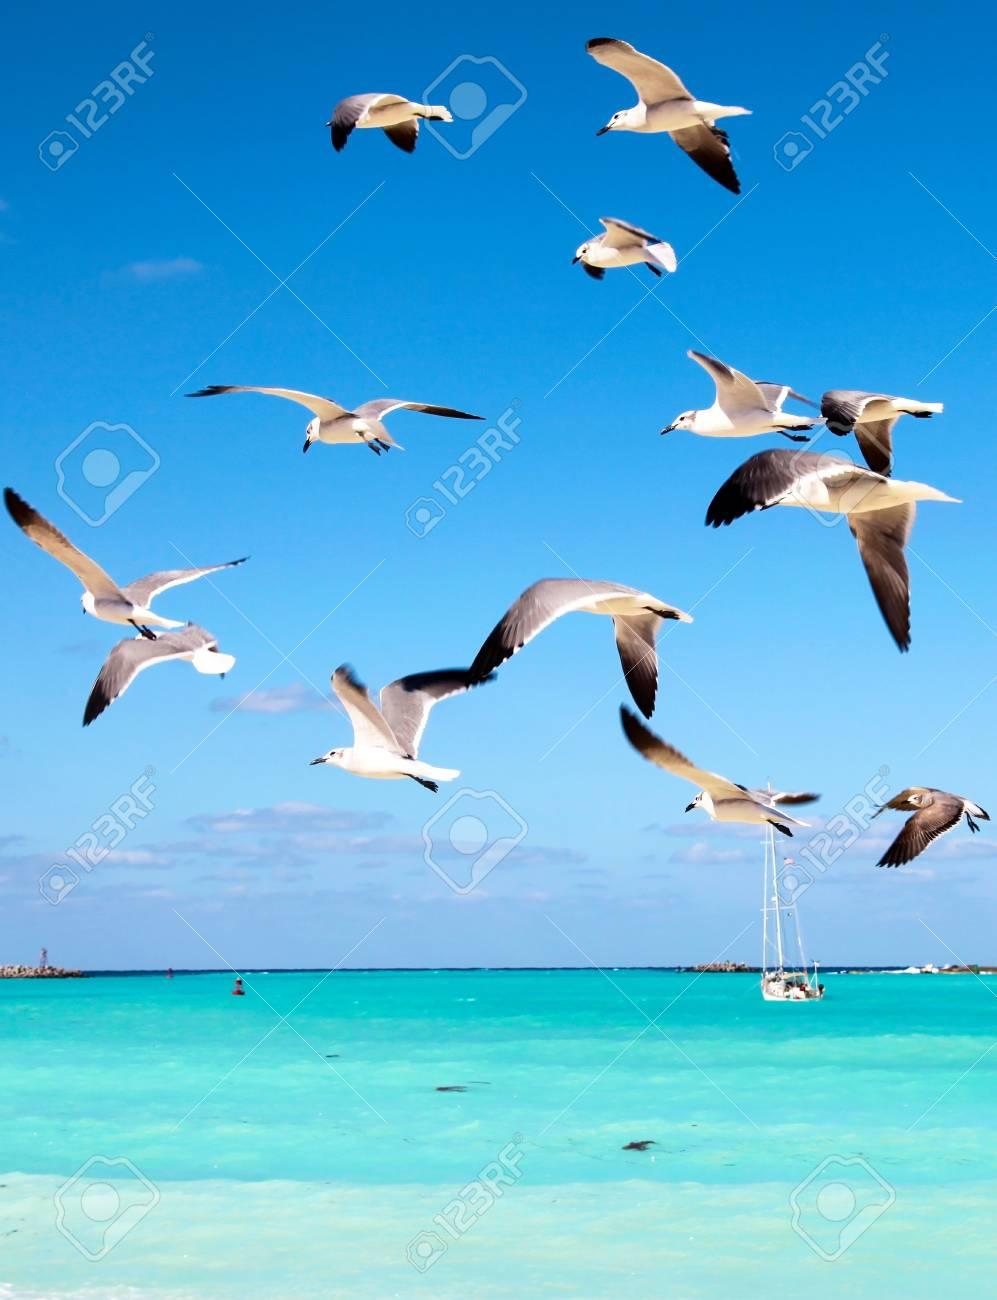 Sea gulls fly over the sea, cutting through a beautiful blue sky Stock Photo - 19620483